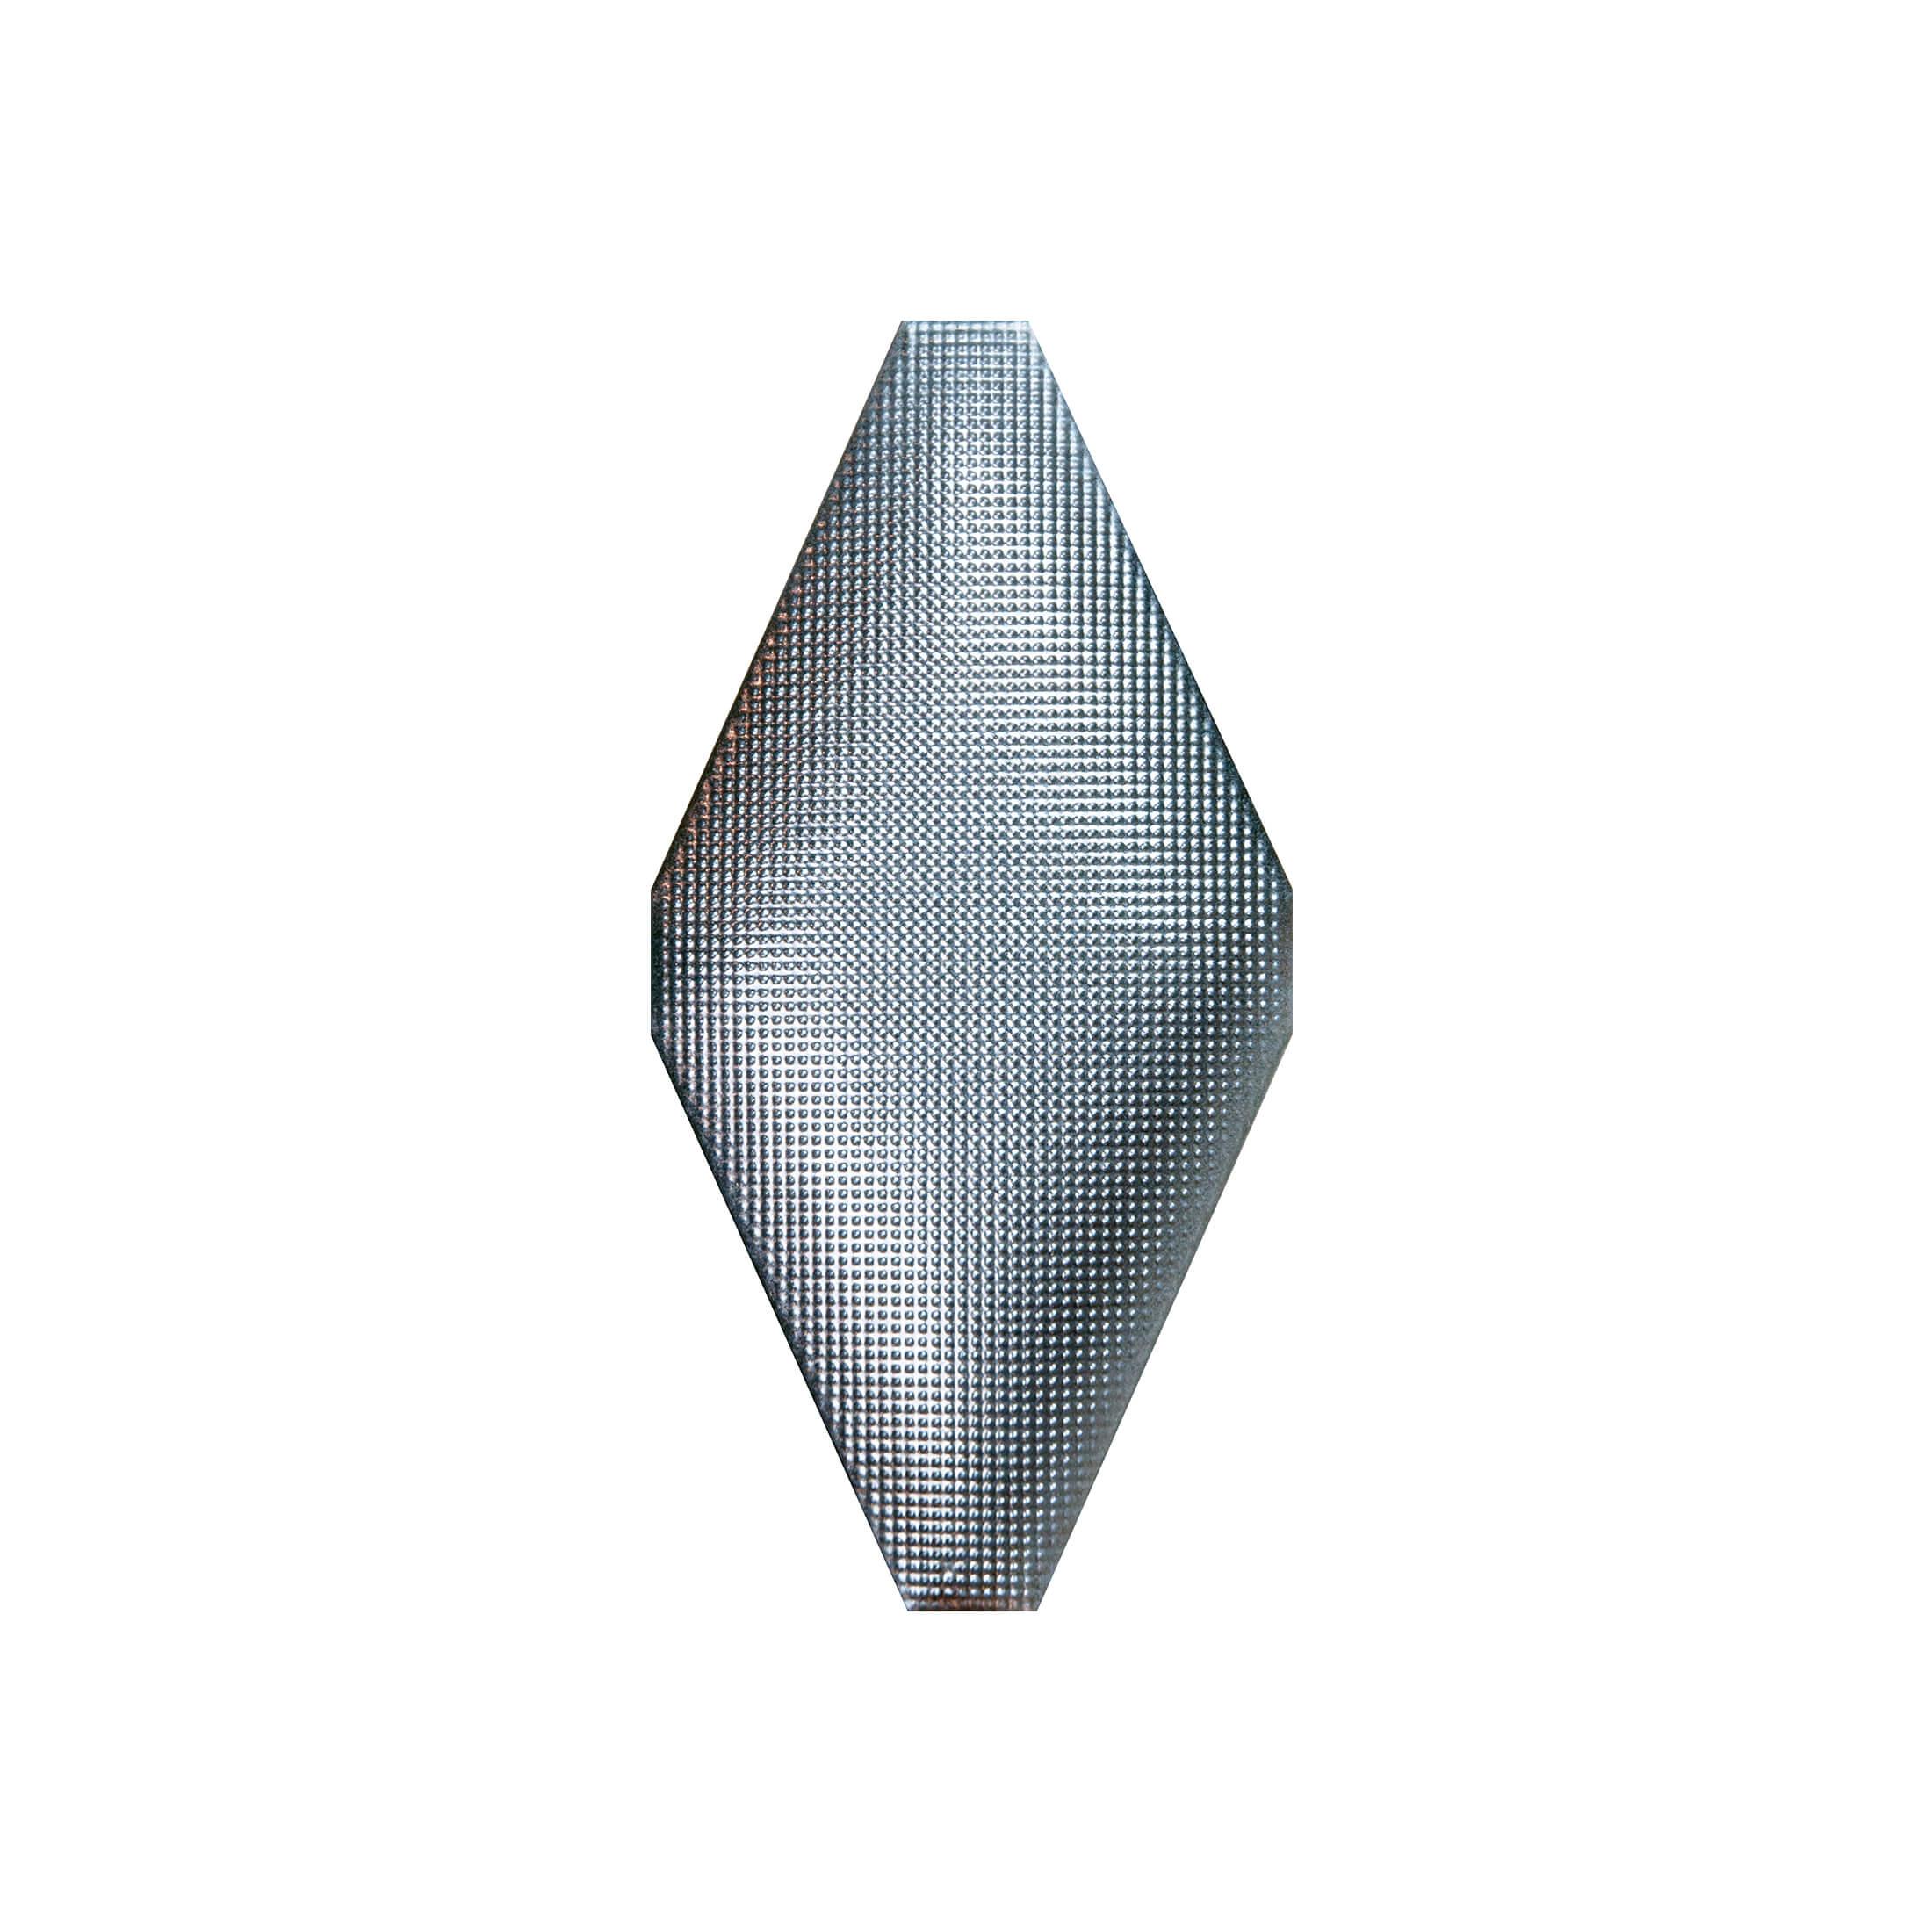 ADEX-ADNE8124-ROMBO-ACOLCHADO PLATINO -10 cm-20 cm-ROMBOS>MICRO